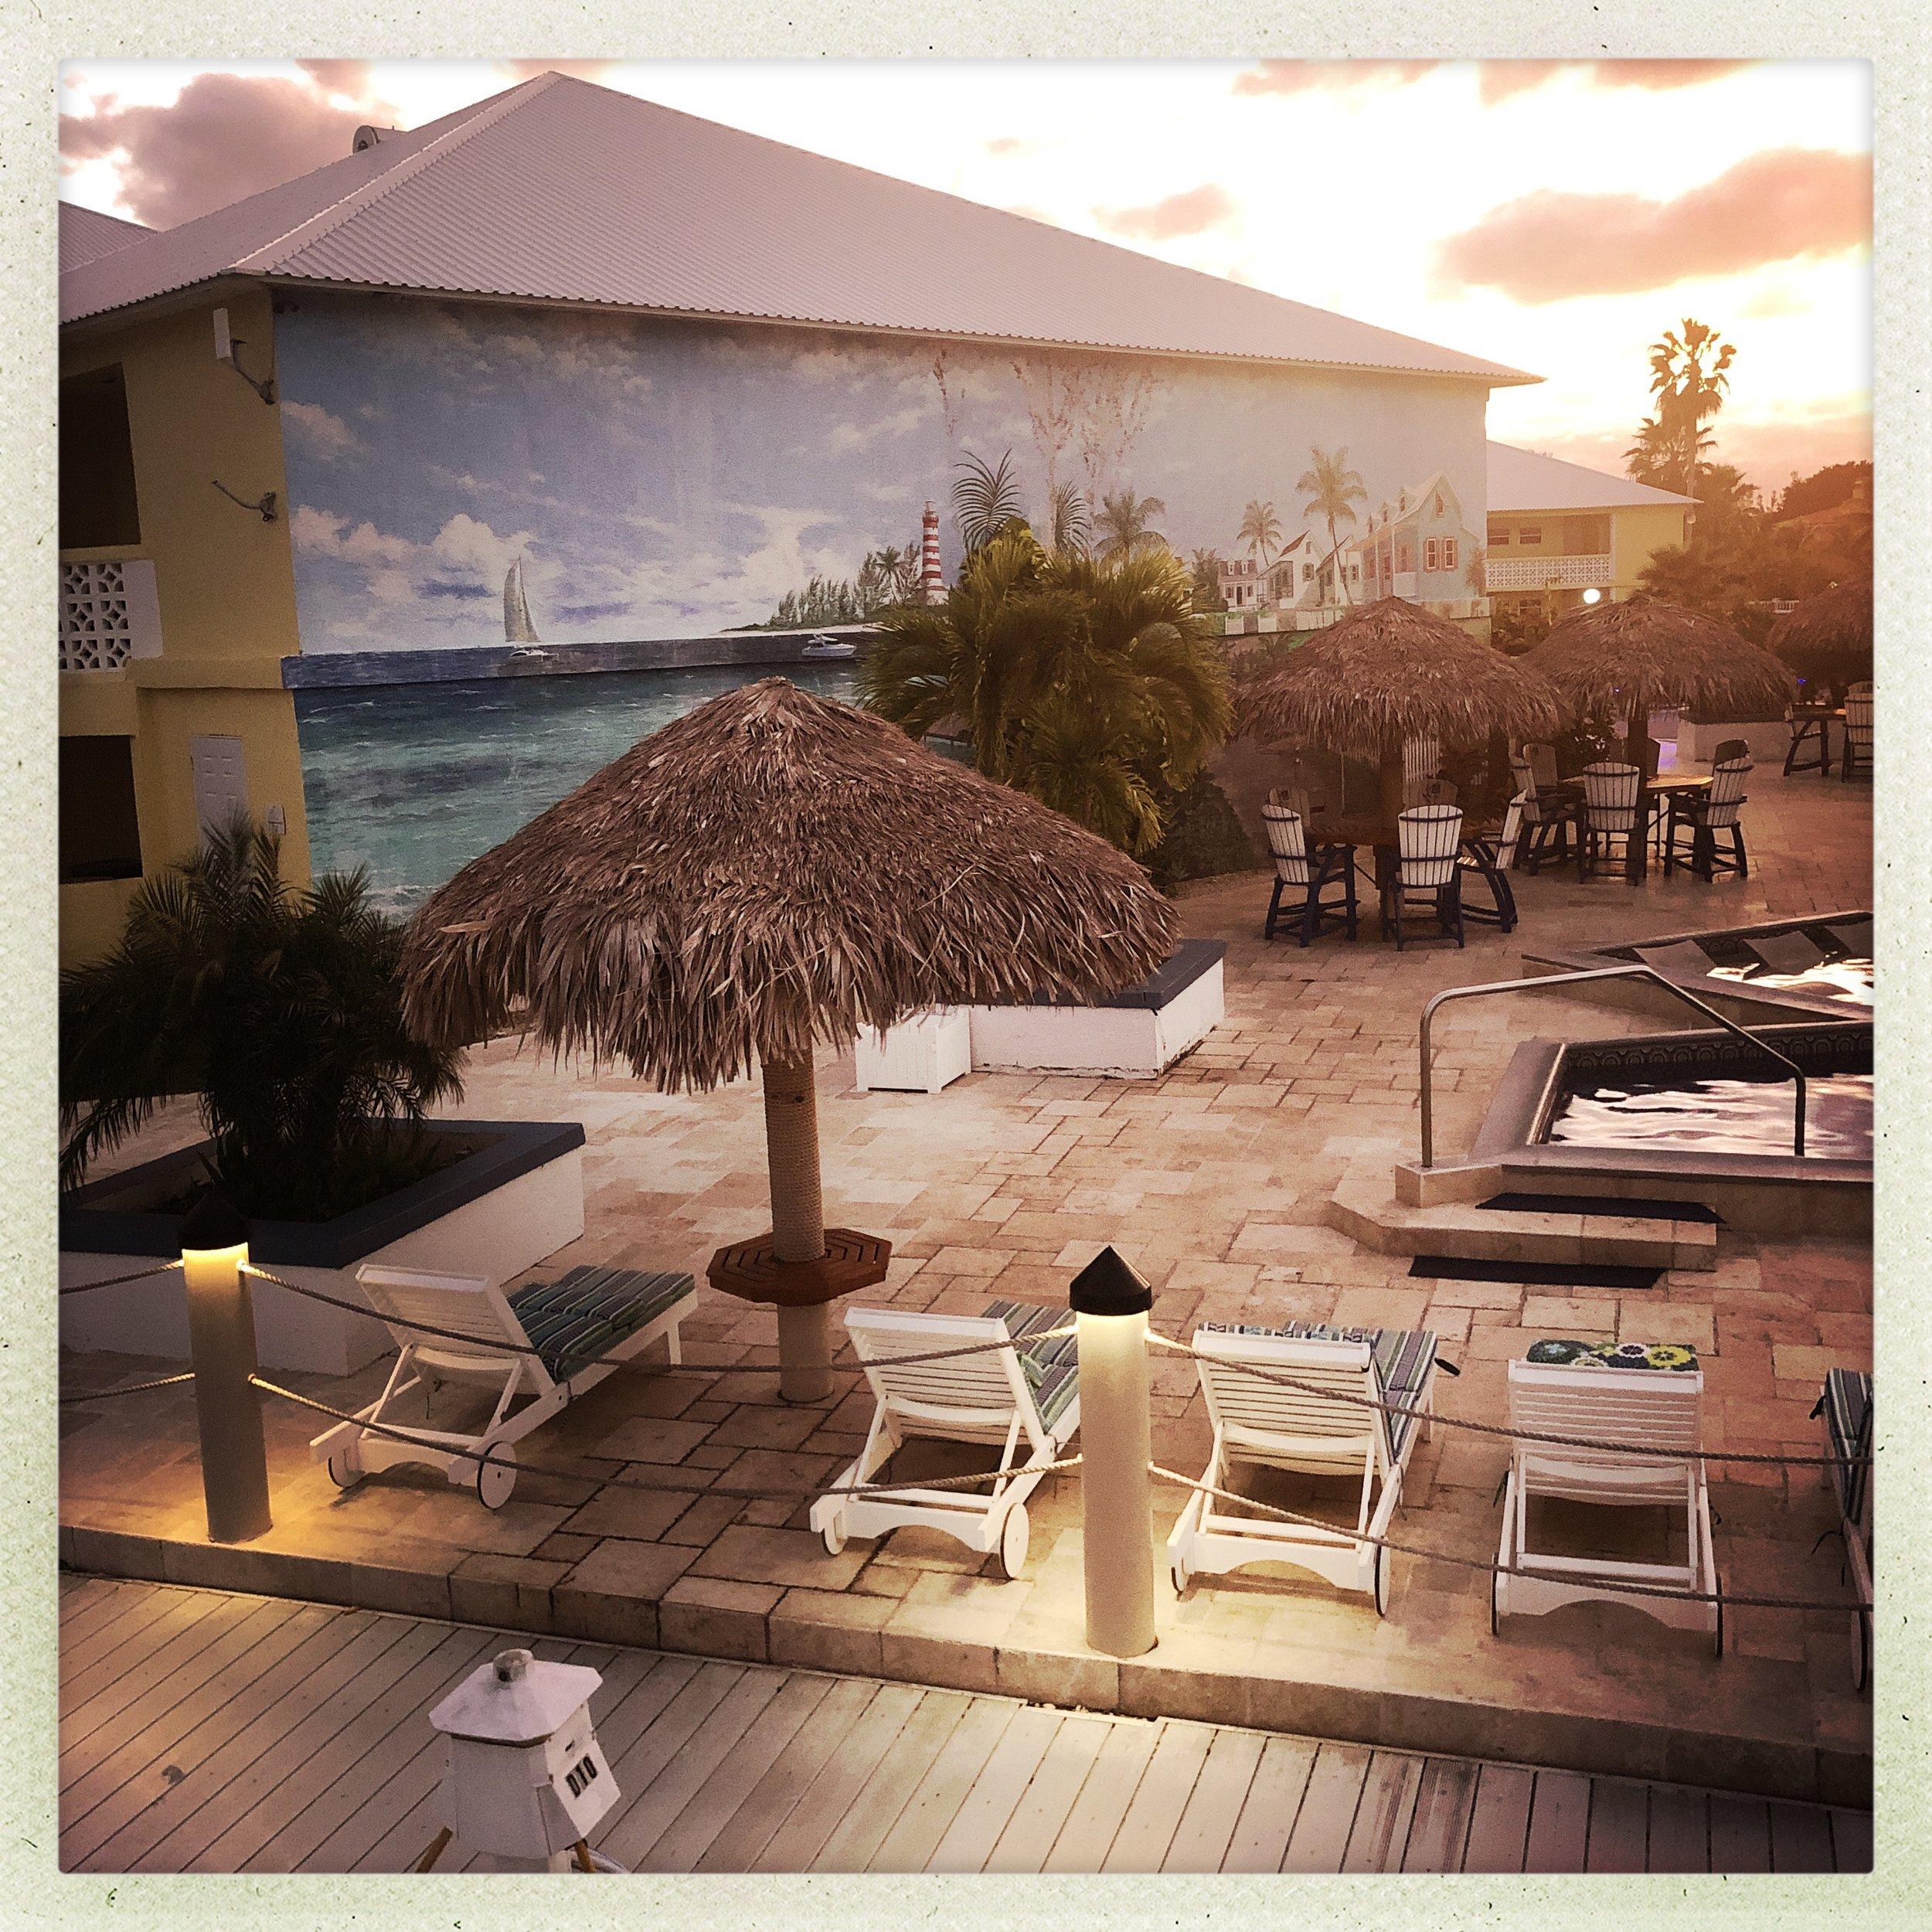 Sunsnet views at Ocean Reef Yacht Club & Resort on Grand Bahama Island